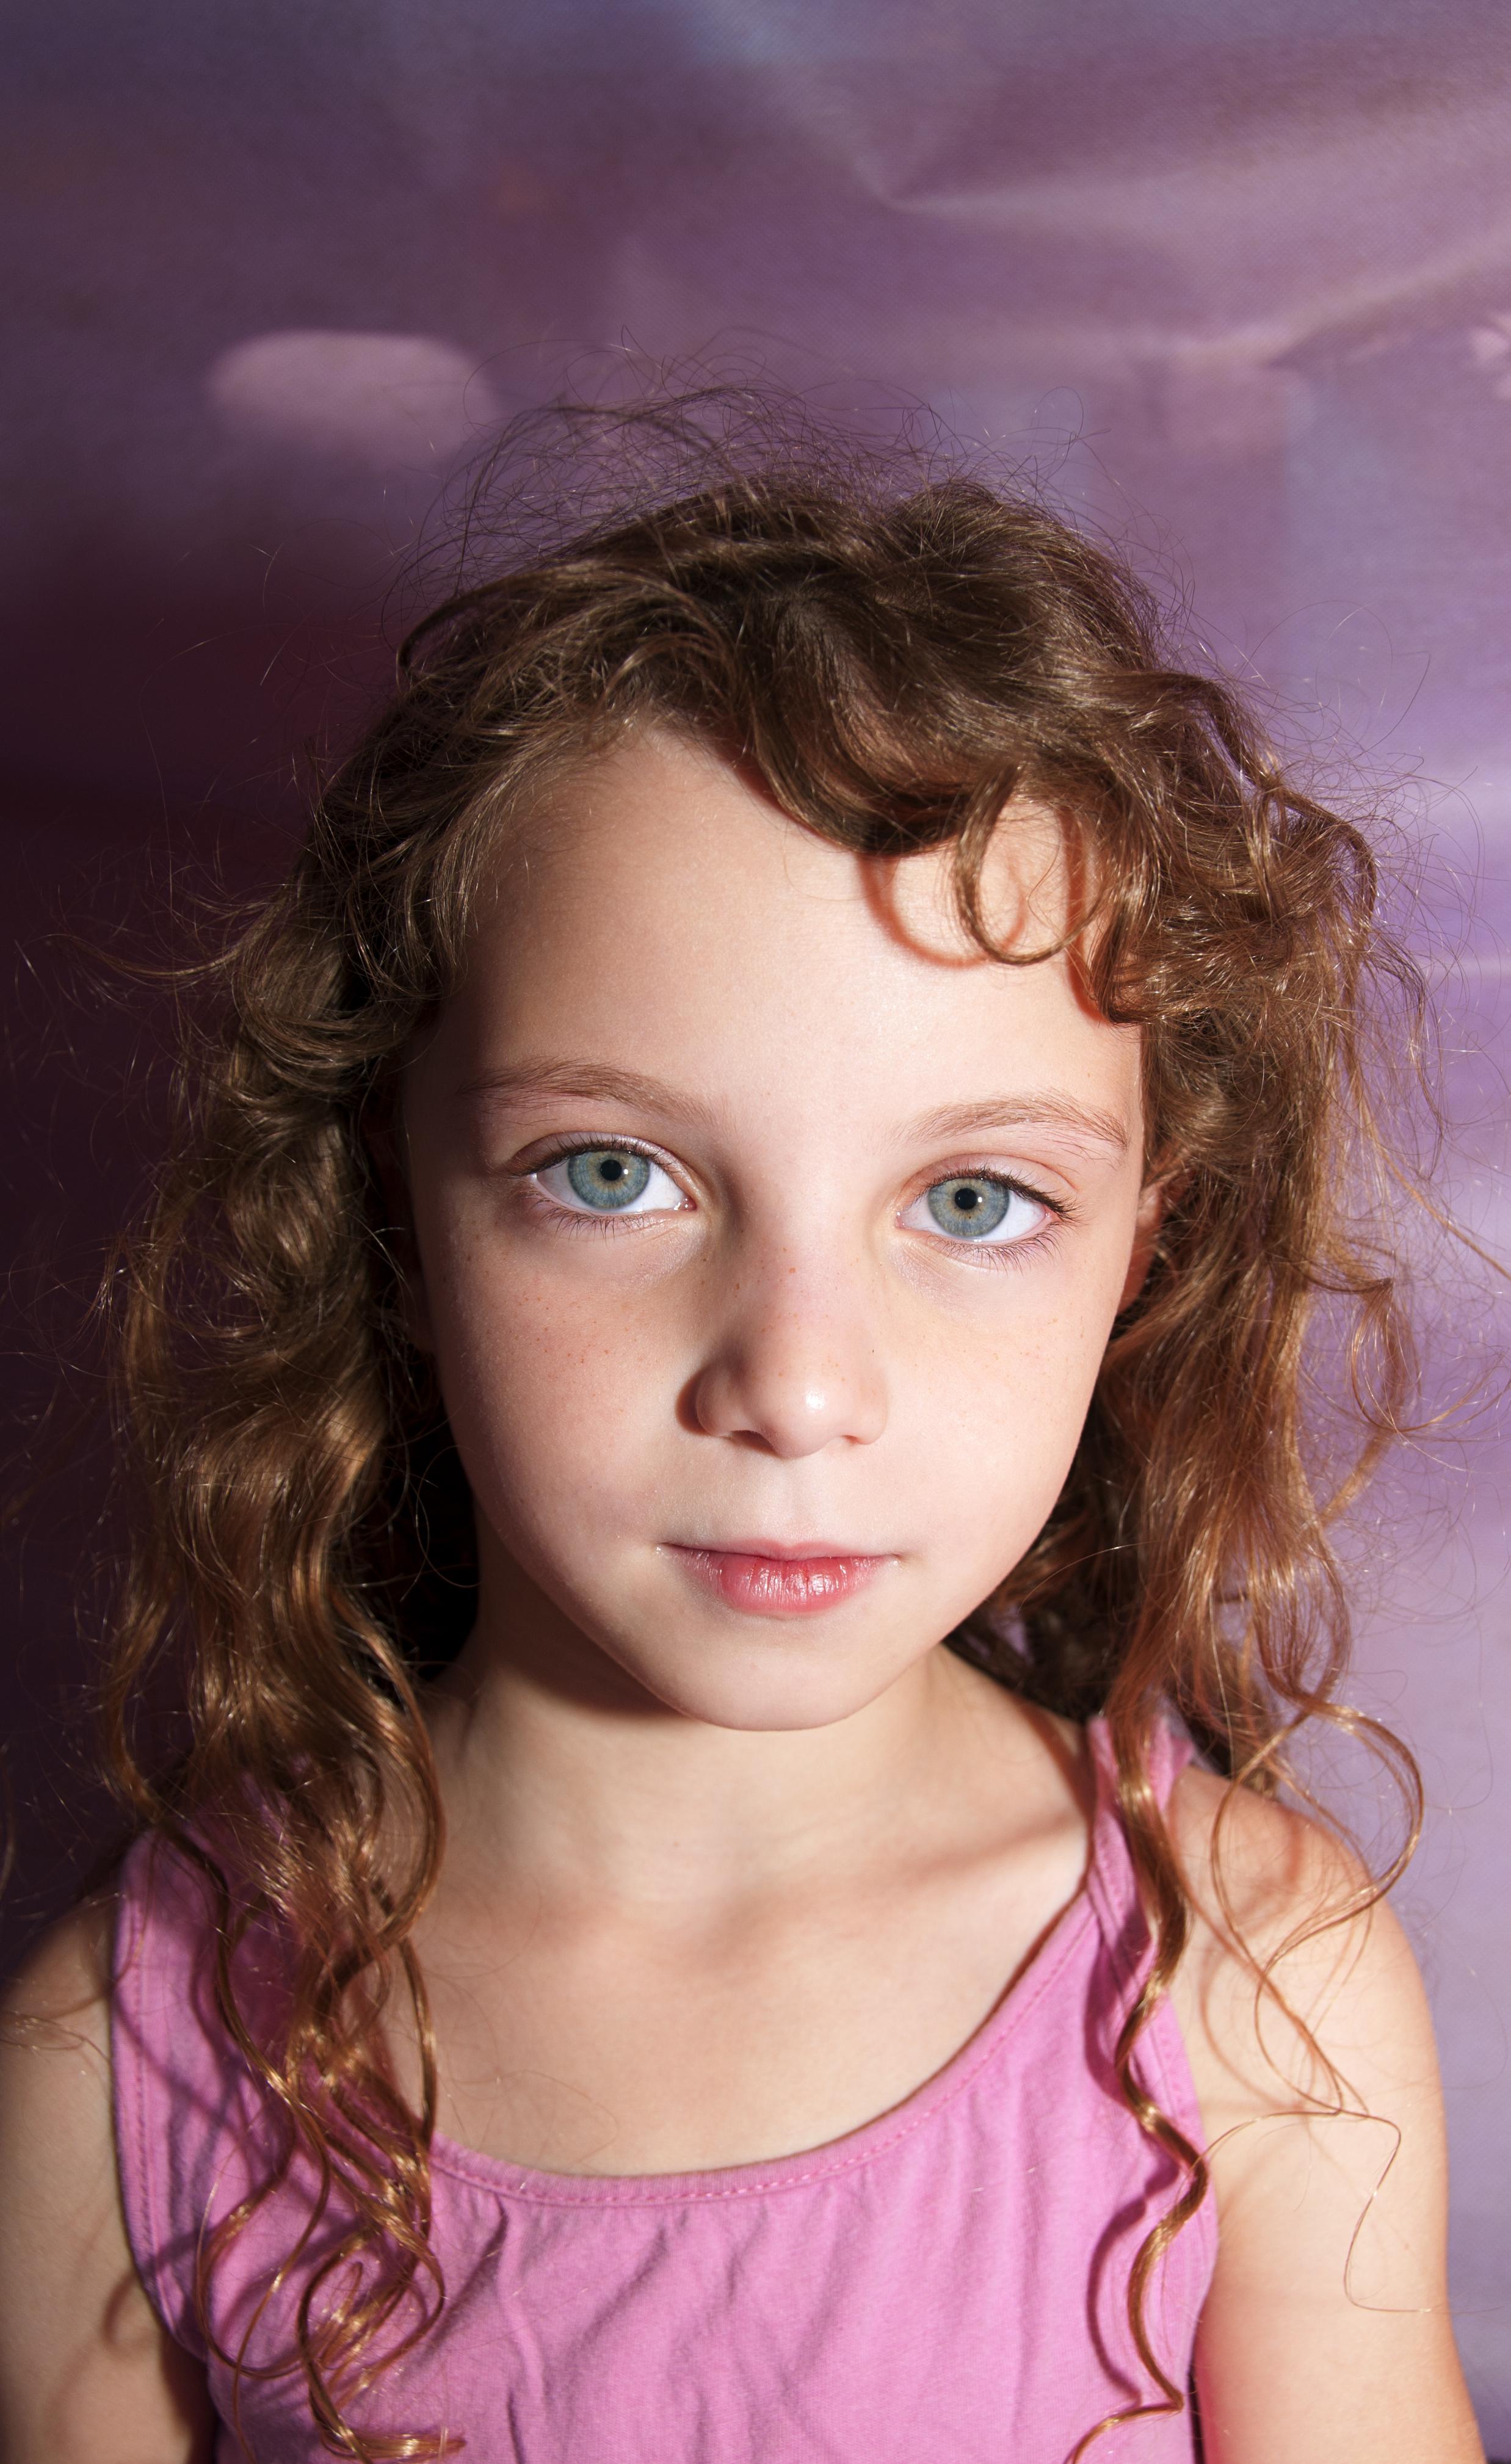 Violet Dreams, Yokneam, September 2013